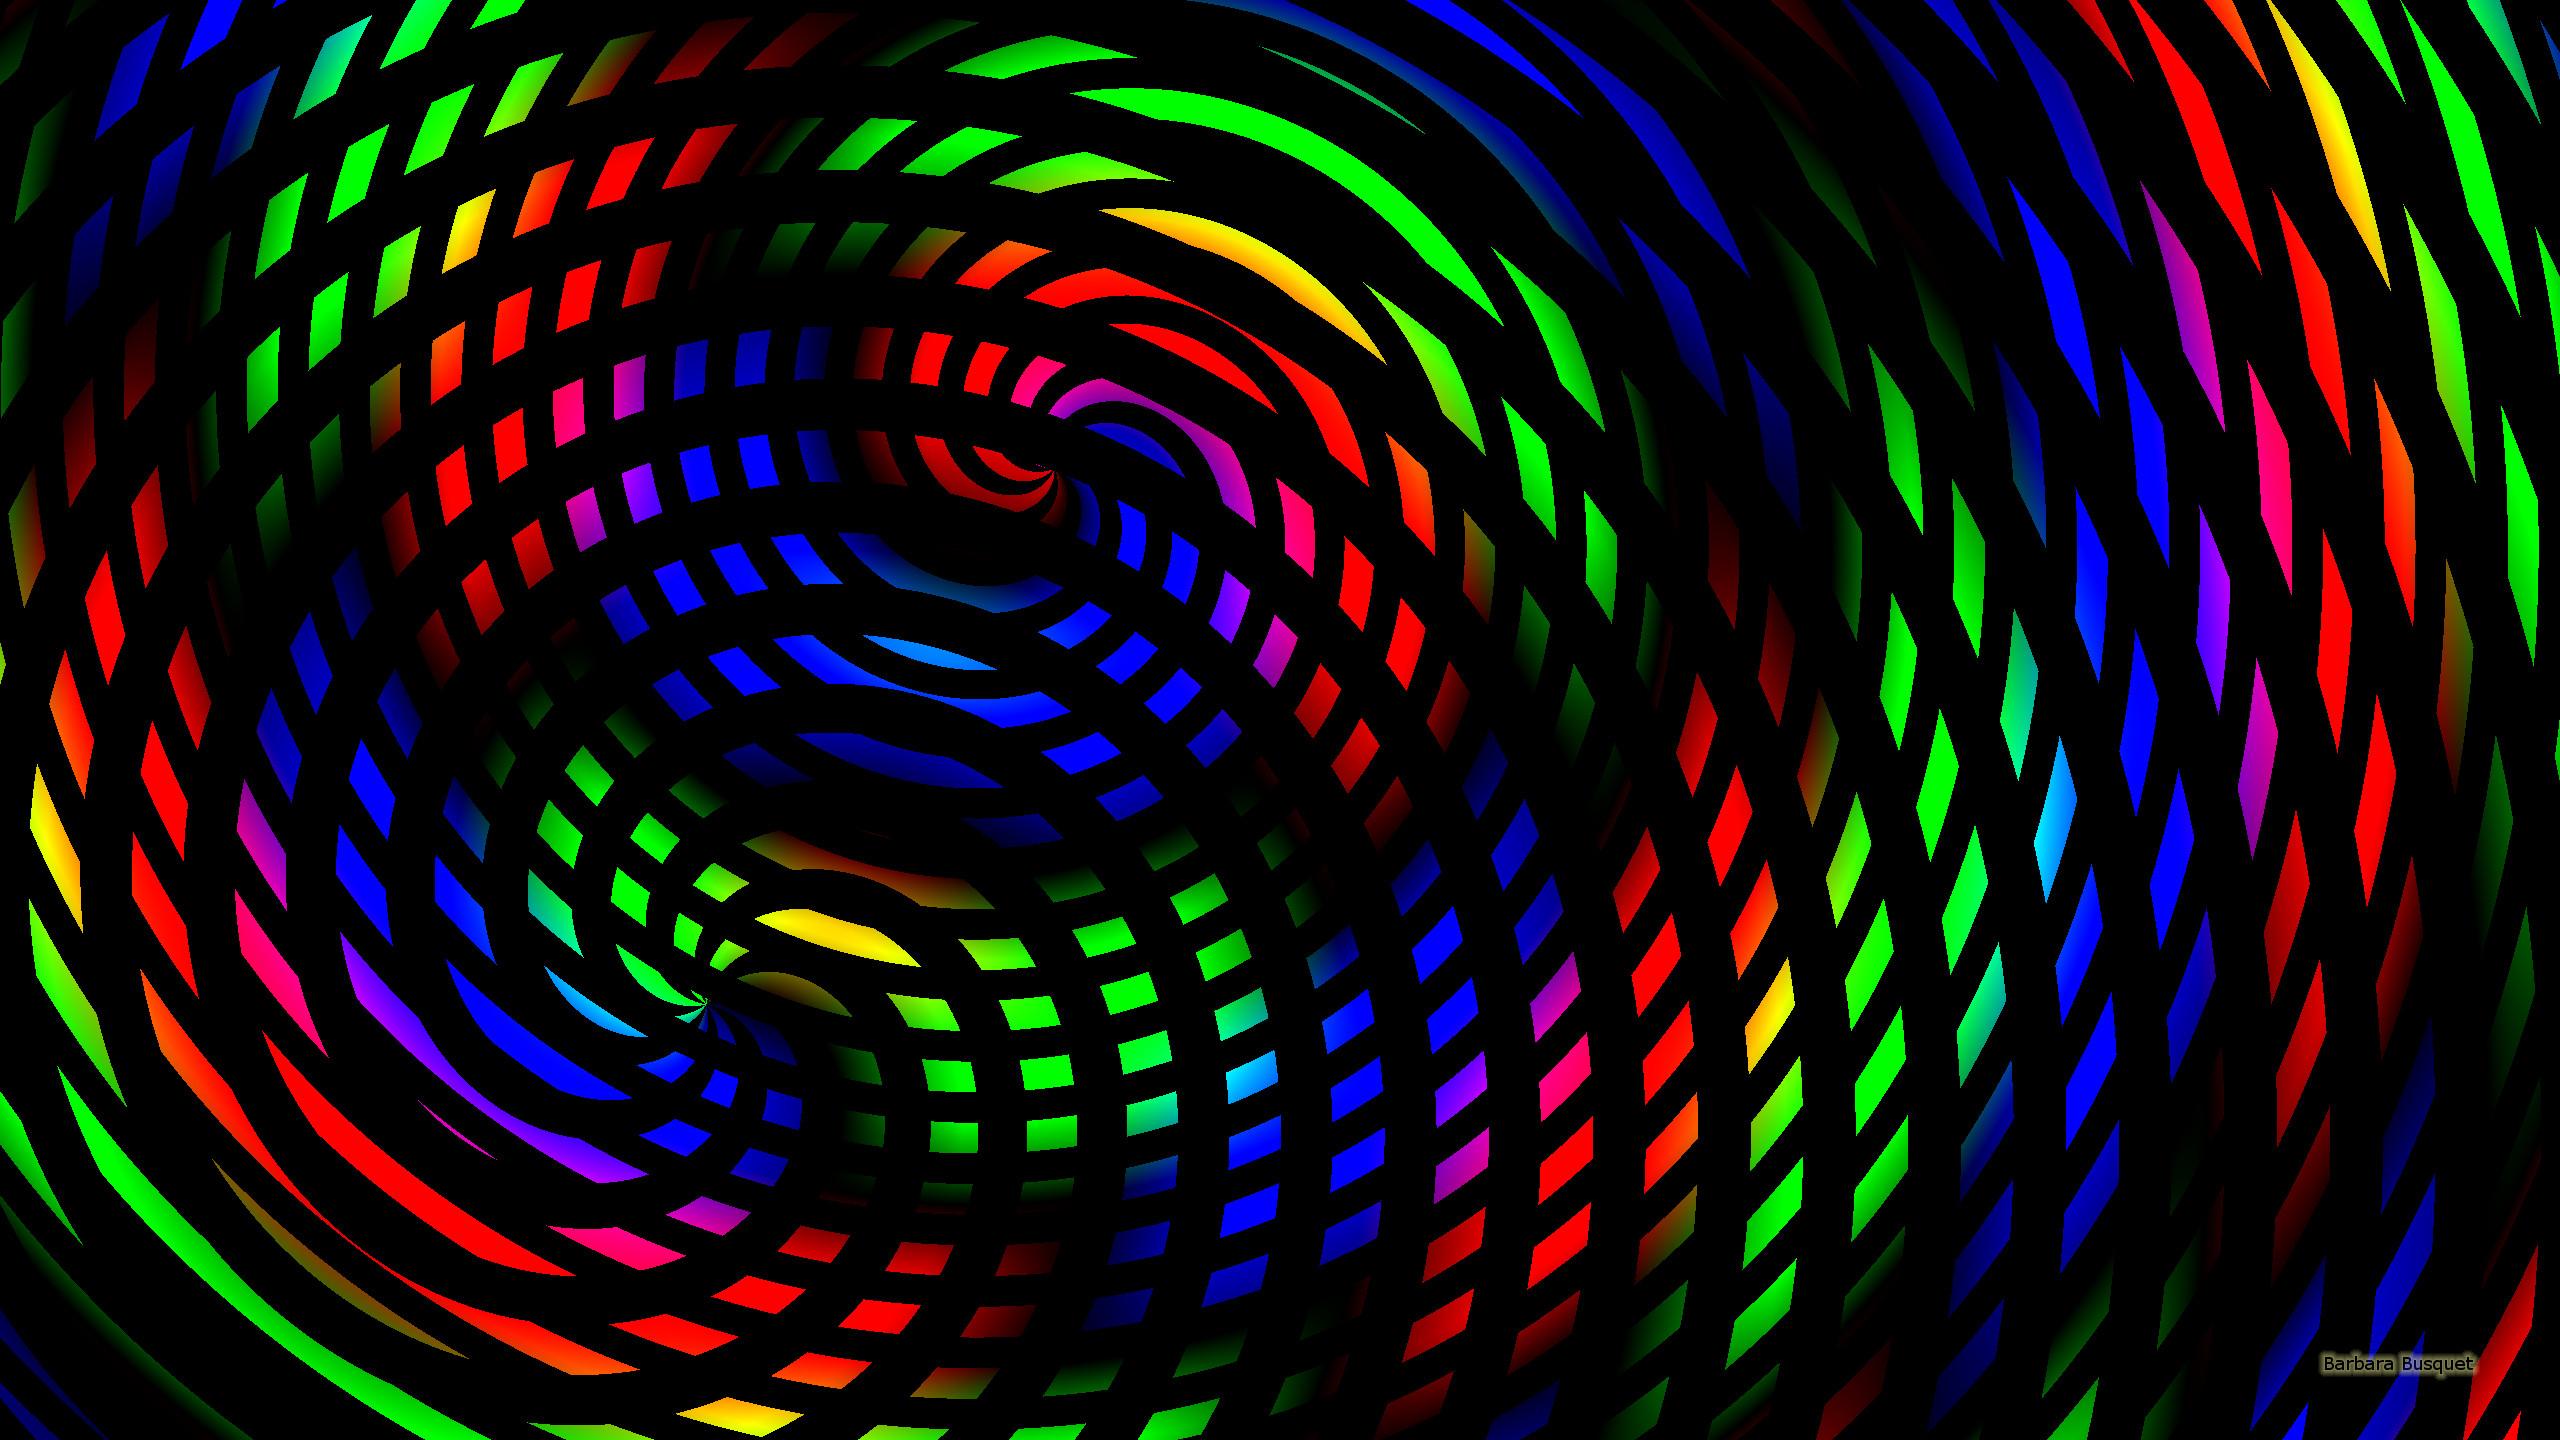 Rainbow Spiral Barbara S Hd Wallpapers